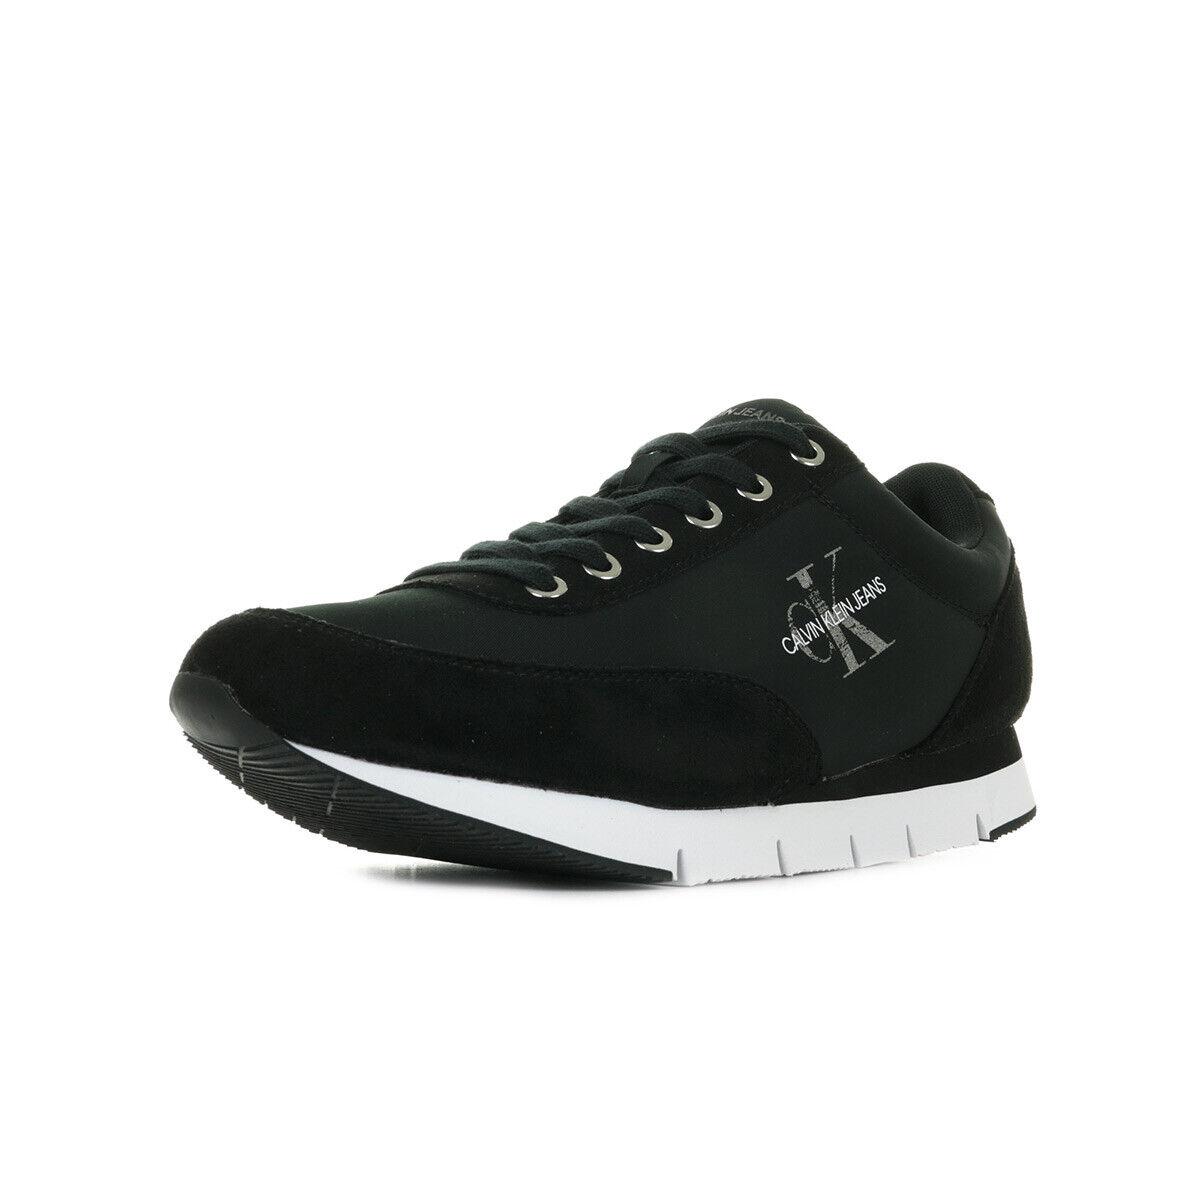 Noire Klein Chaussures Jarod Calvin Noir Lacets Baskets Nylon Taille Homme xoeBdC